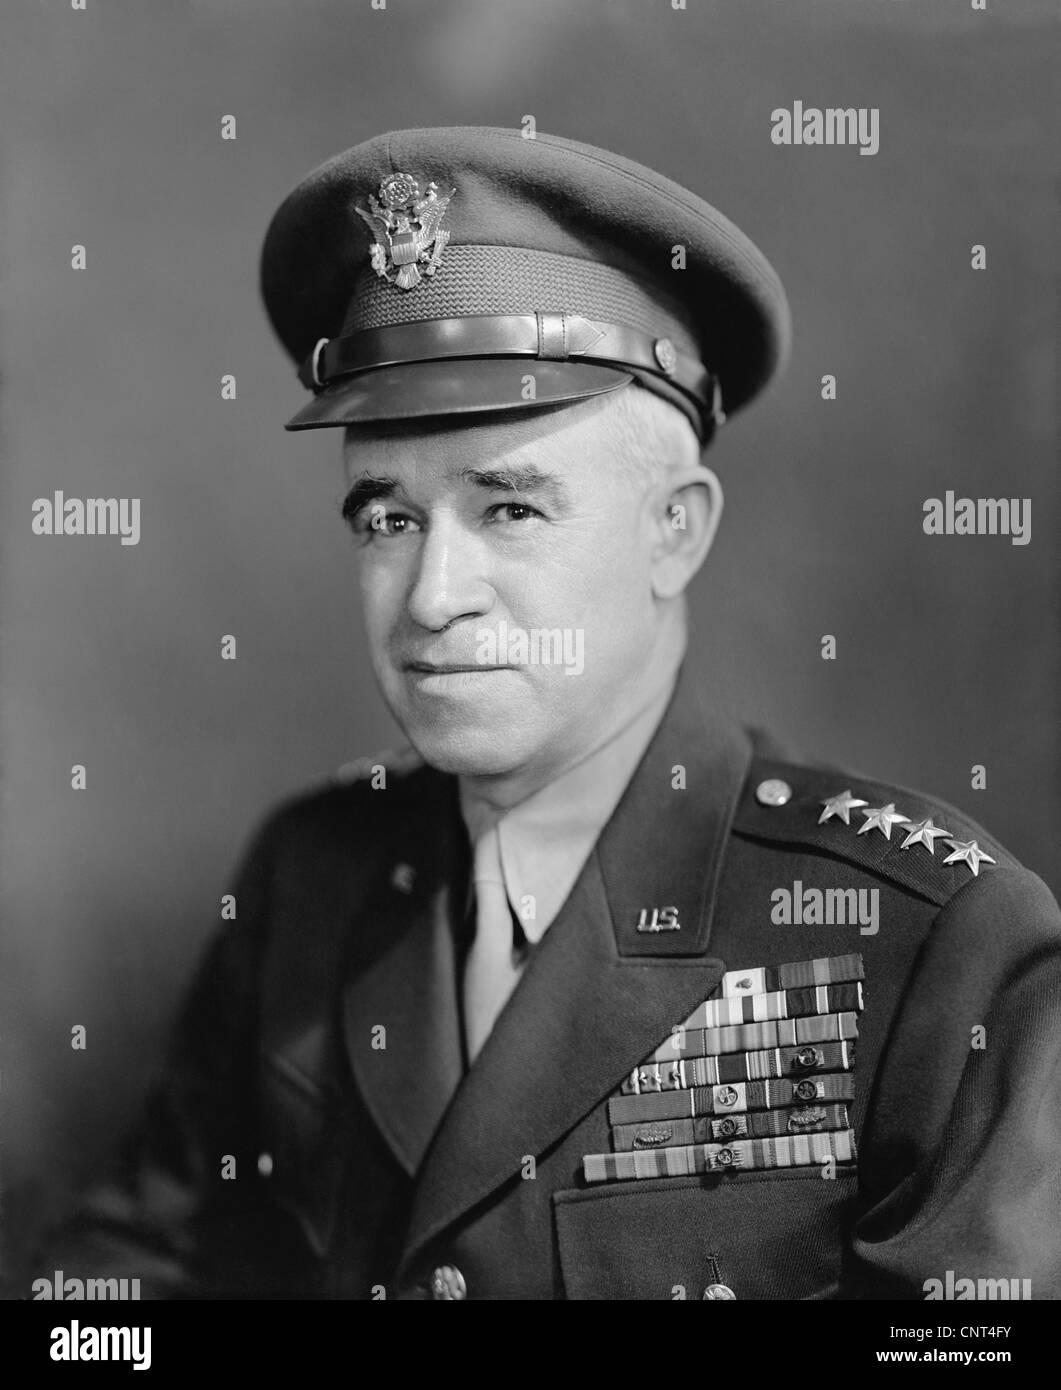 Vintage World War II photo of Four Star General Omar Bradley. - Stock Image